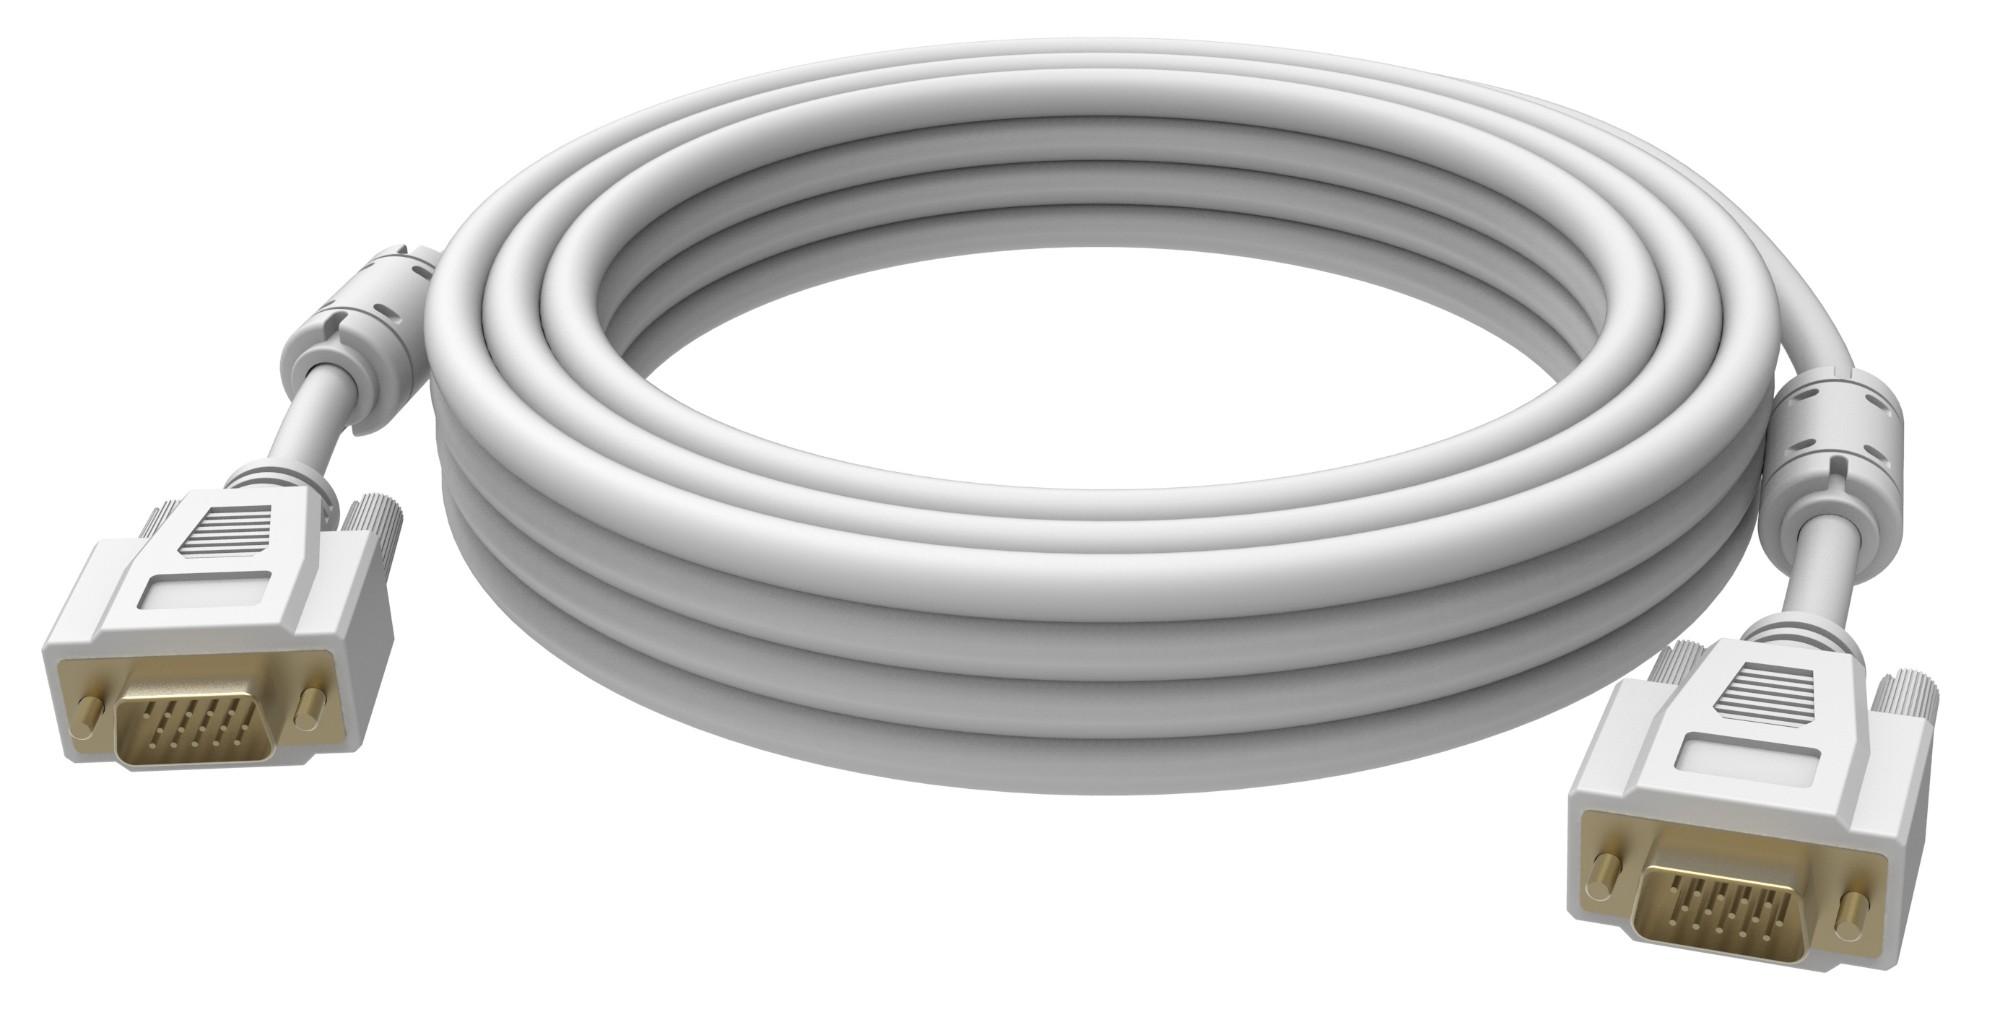 Vision 2x VGA 15-pin D-Sub, 15m cable VGA VGA (D-Sub) Blanco